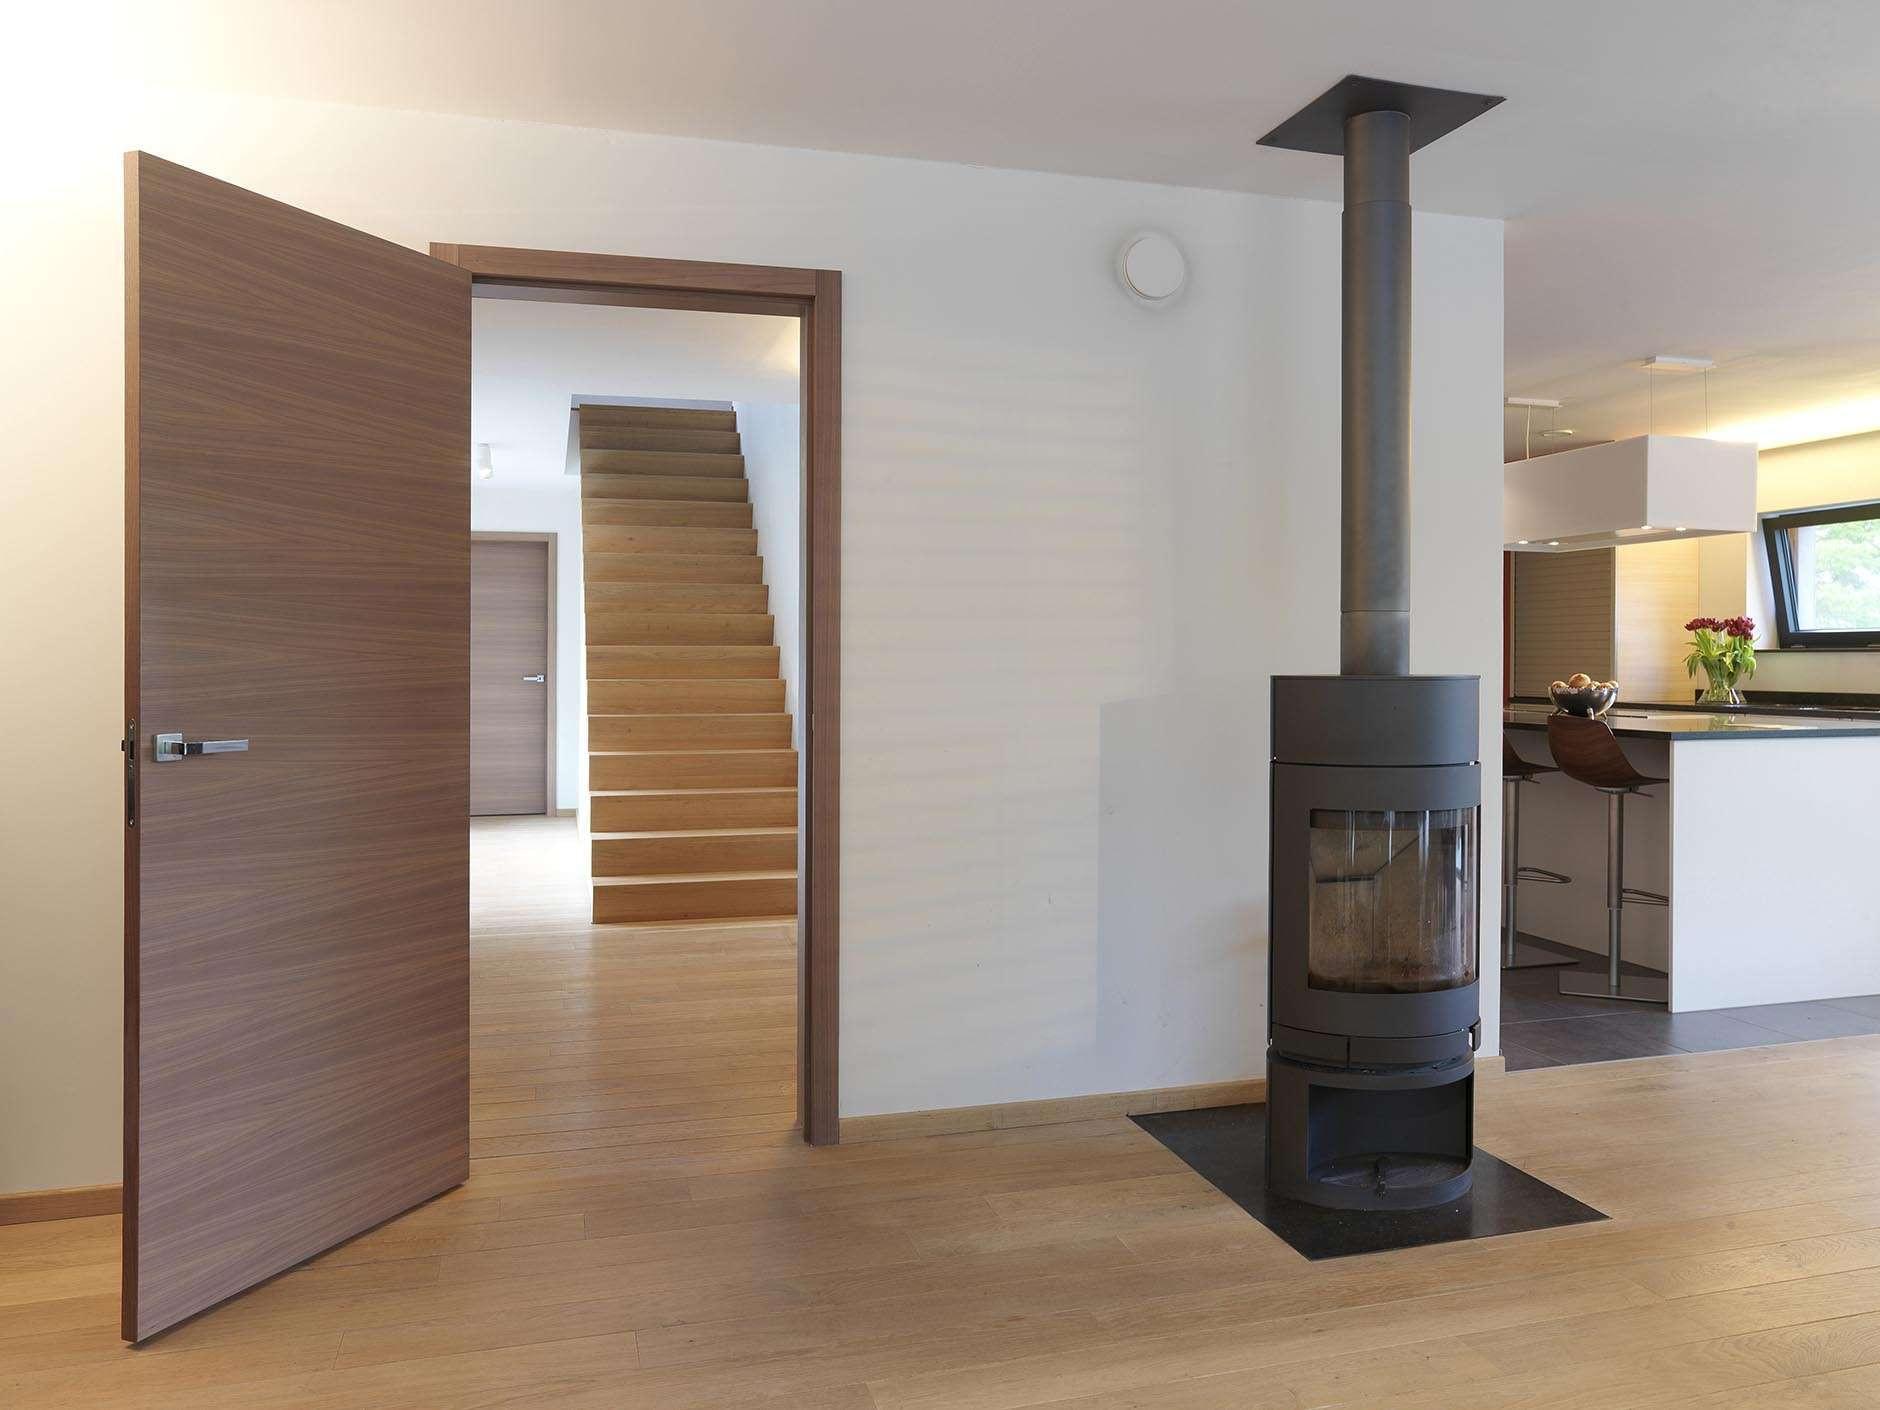 Nordex-parket-binnendeur-hout